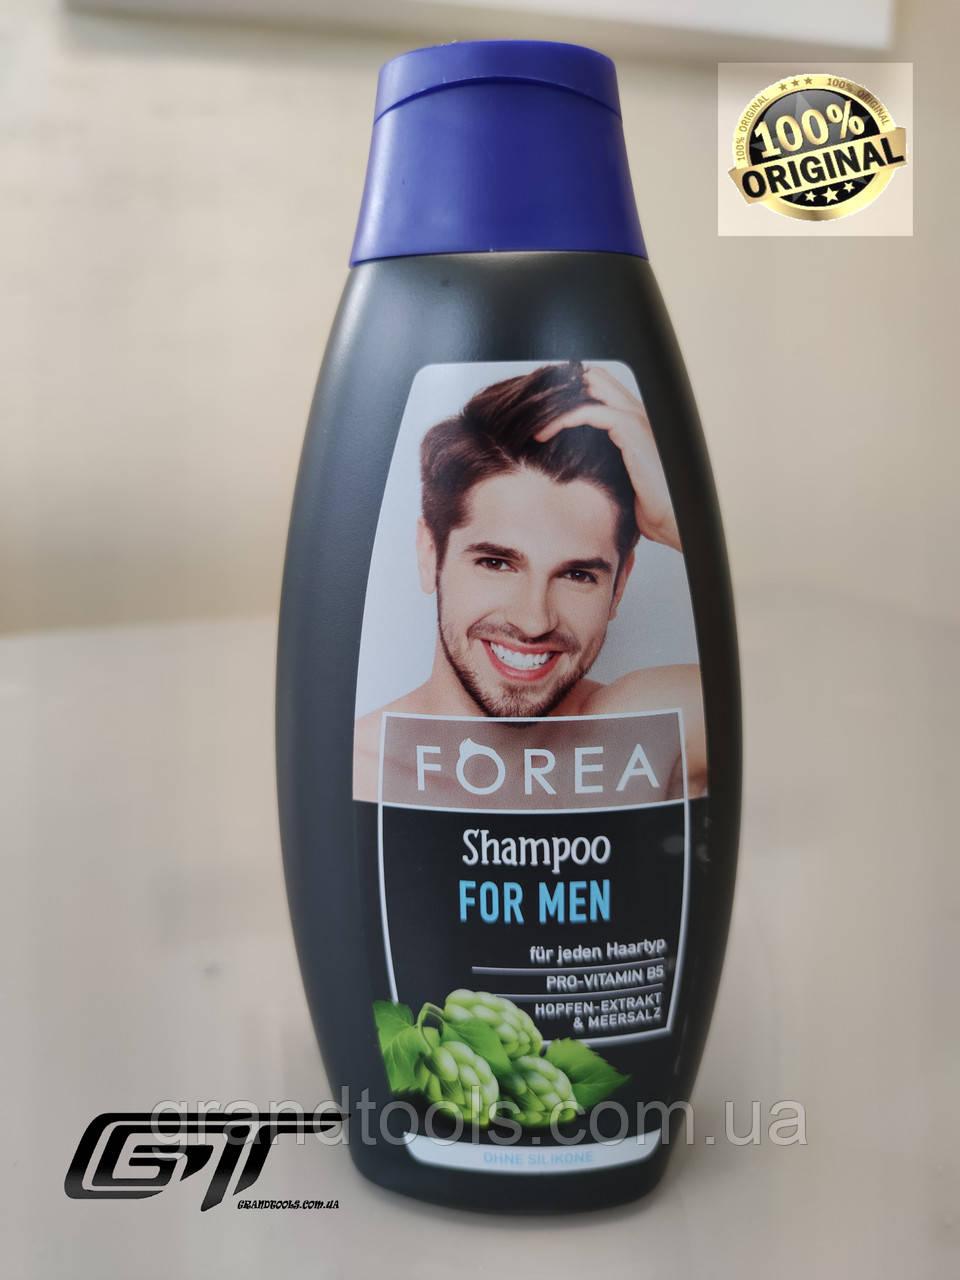 Шампунь FOREA FOR MEN 500мл.